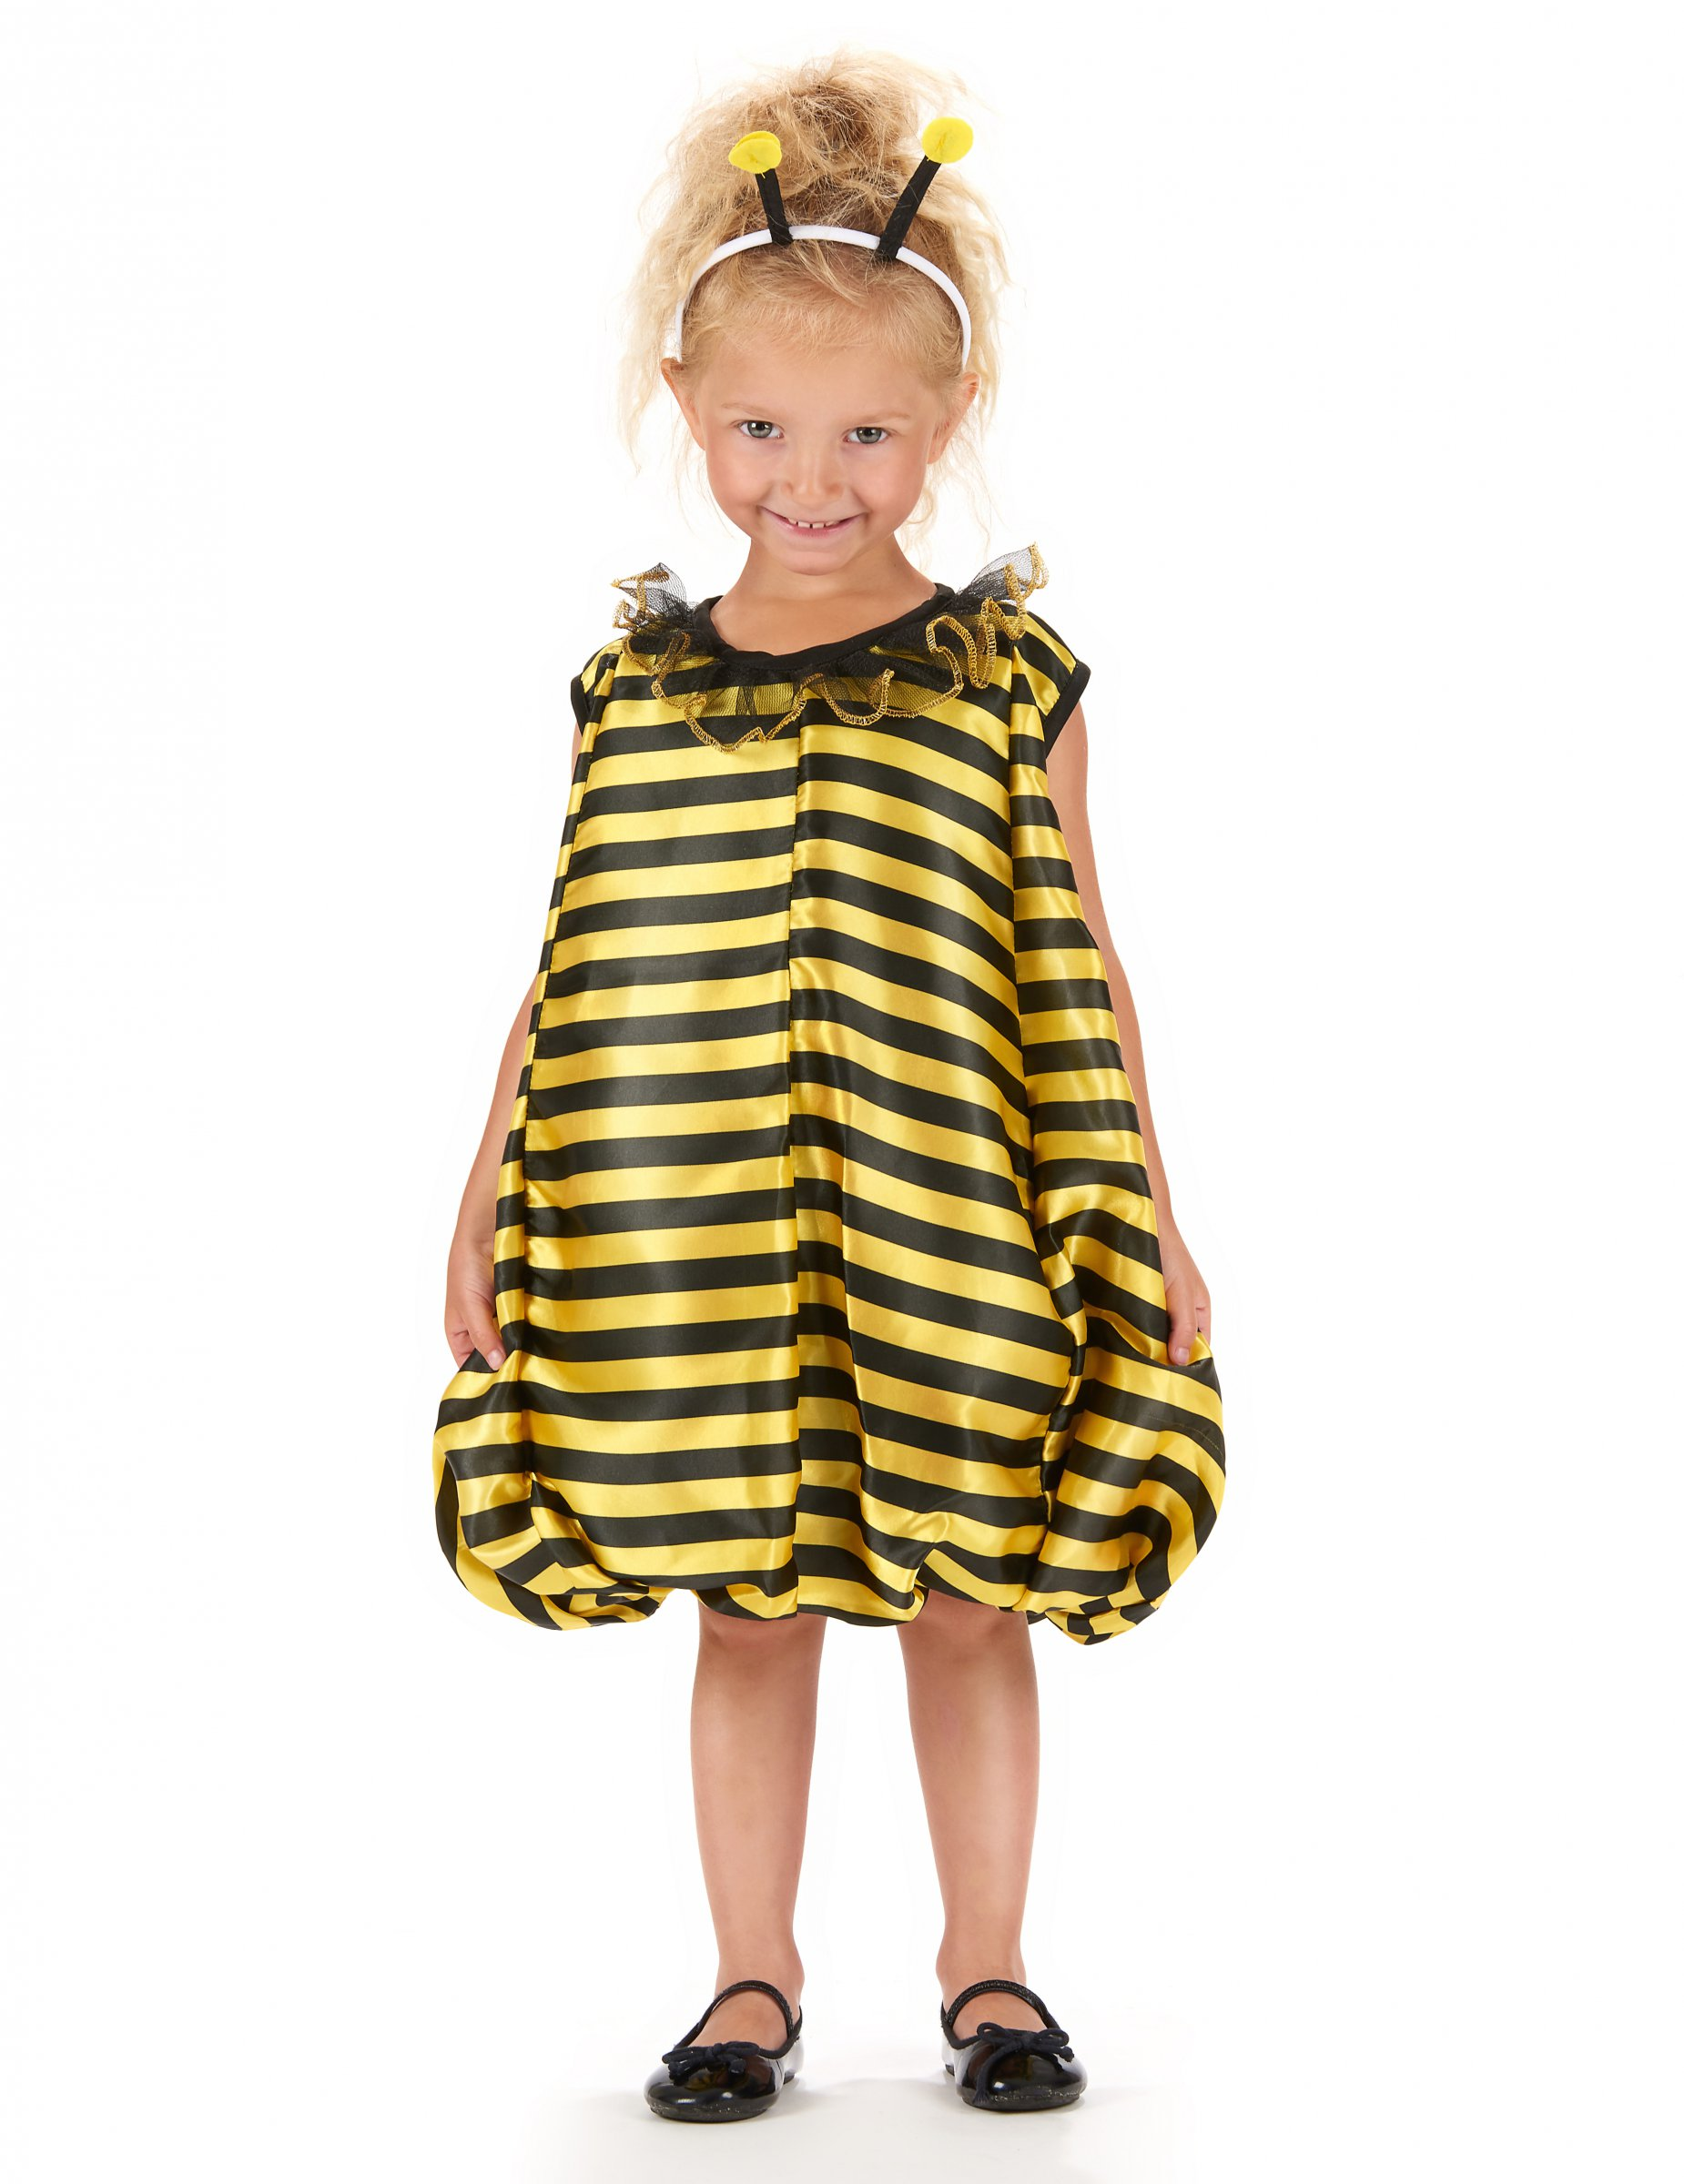 Susses Bienchen Kinderkostum Biene Schwarz Gelb Gunstige Faschings